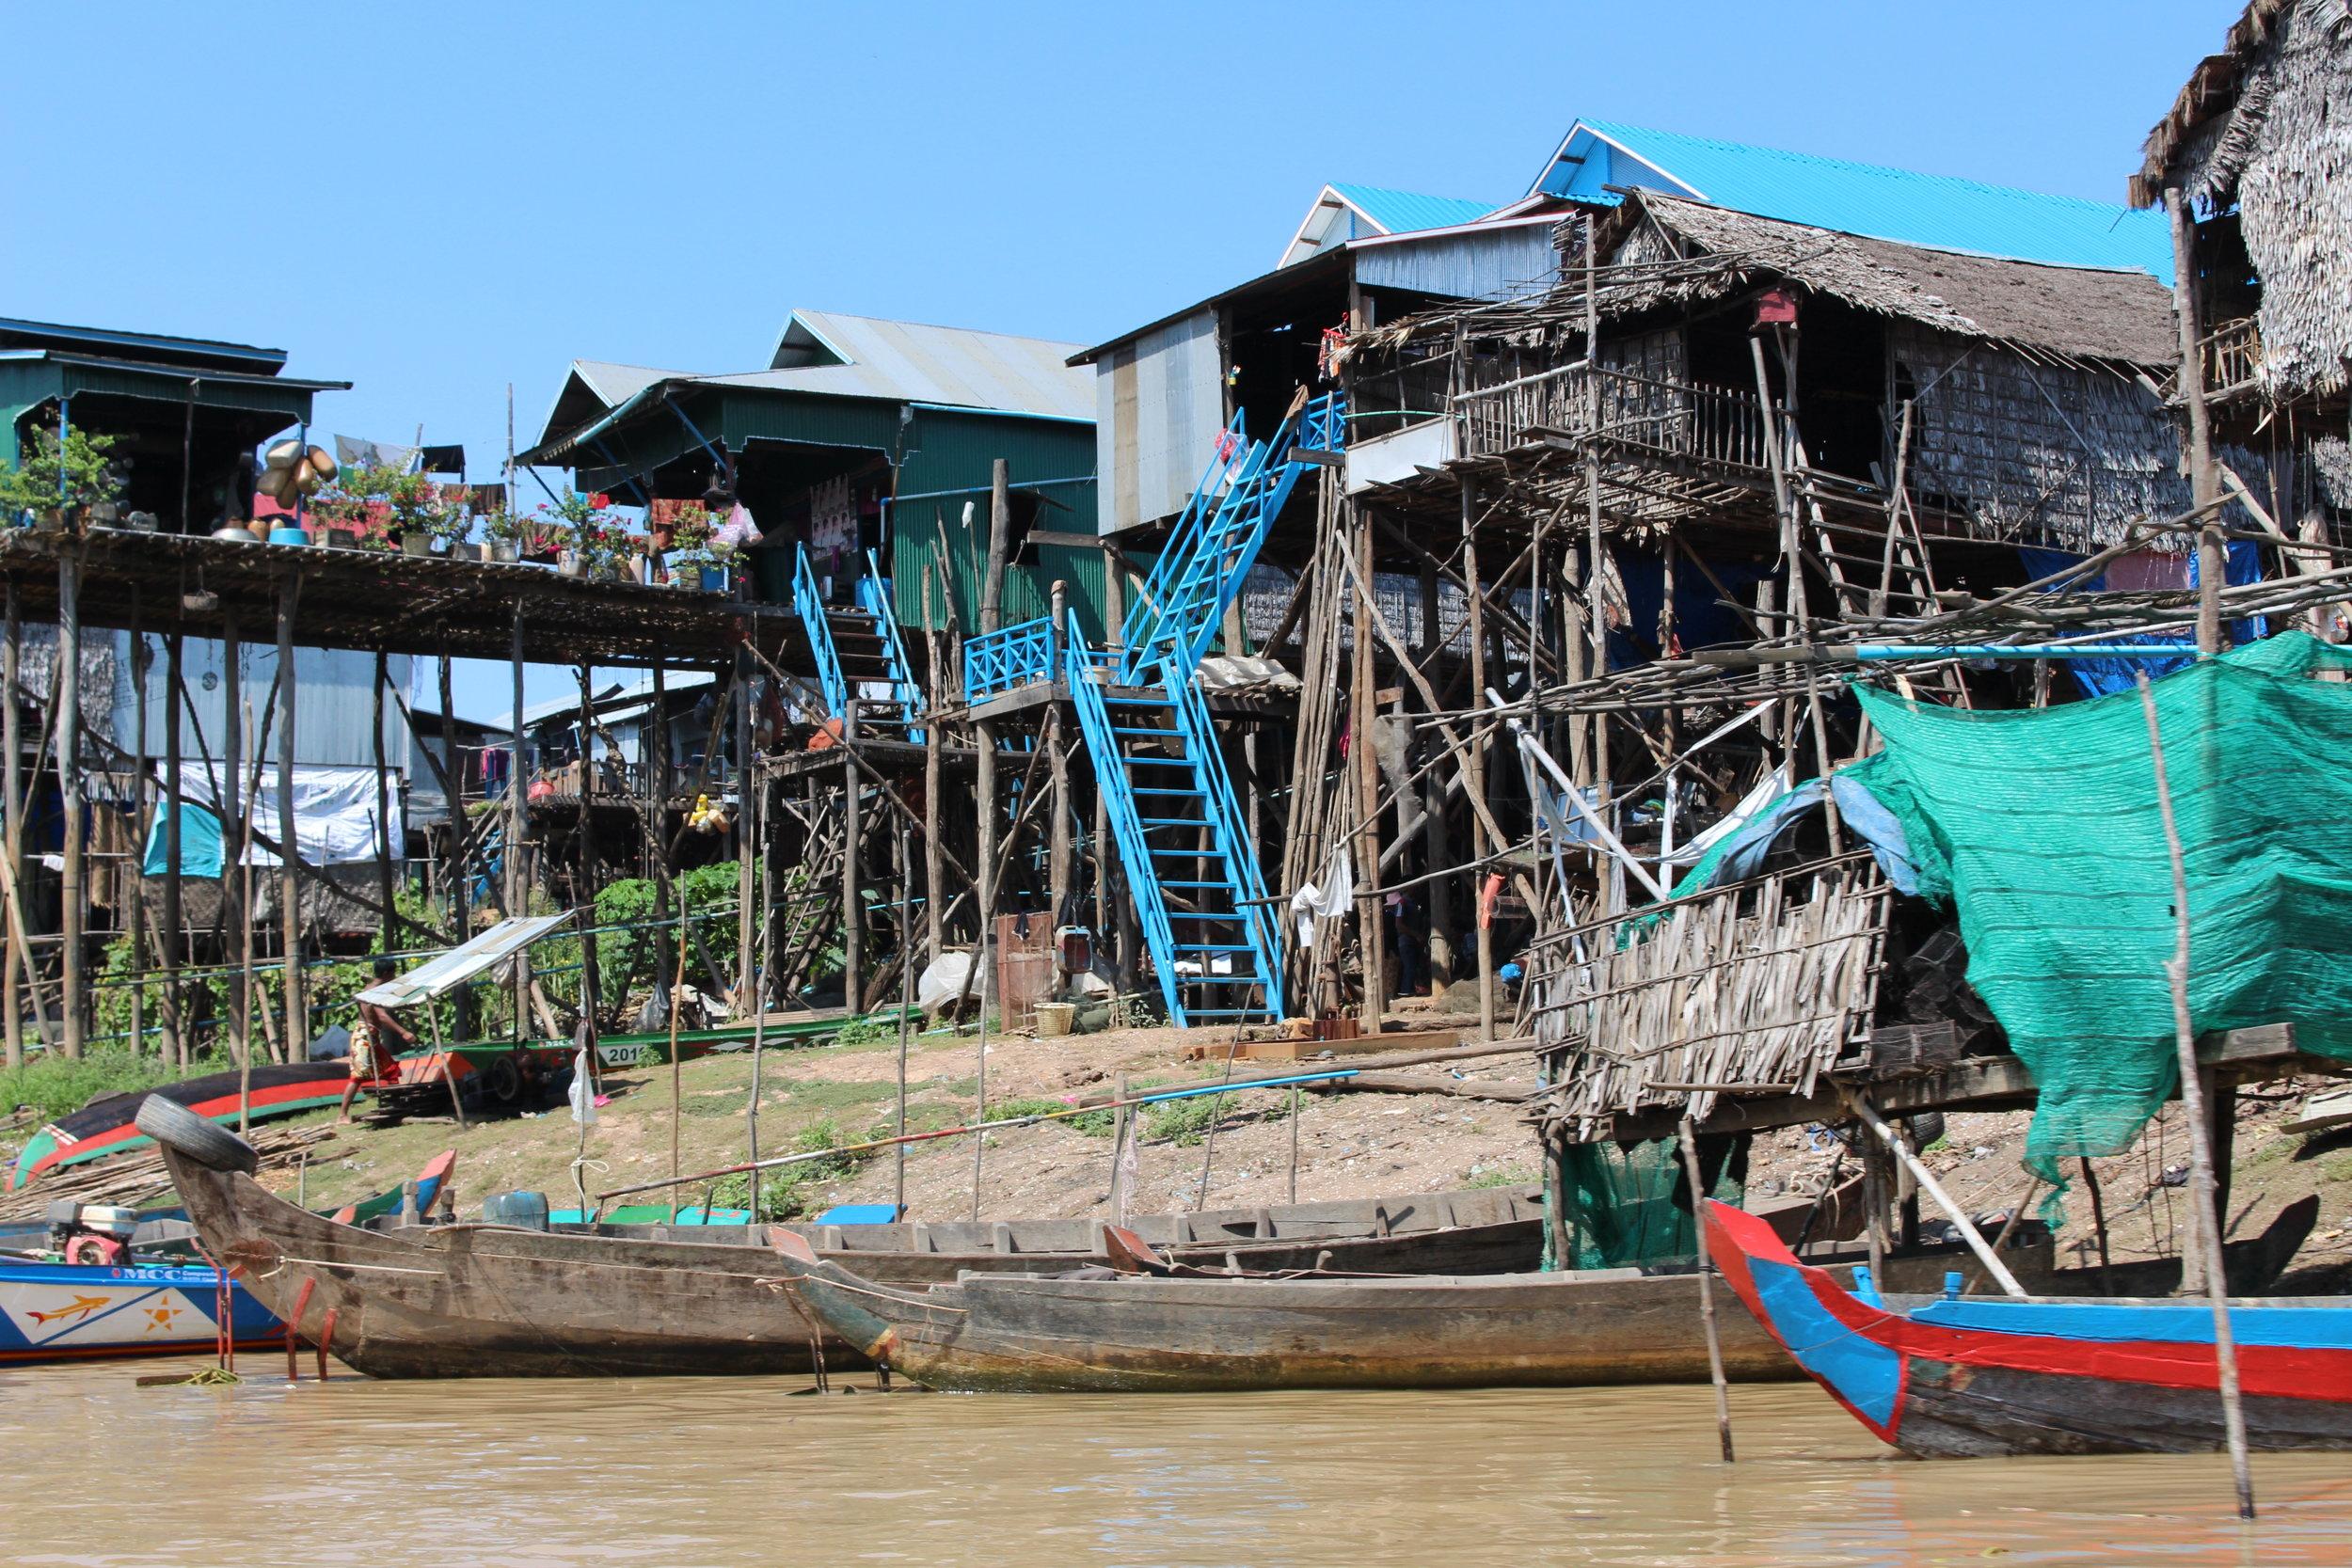 Floating Villages - Lake Tonle Sap, Cambodia